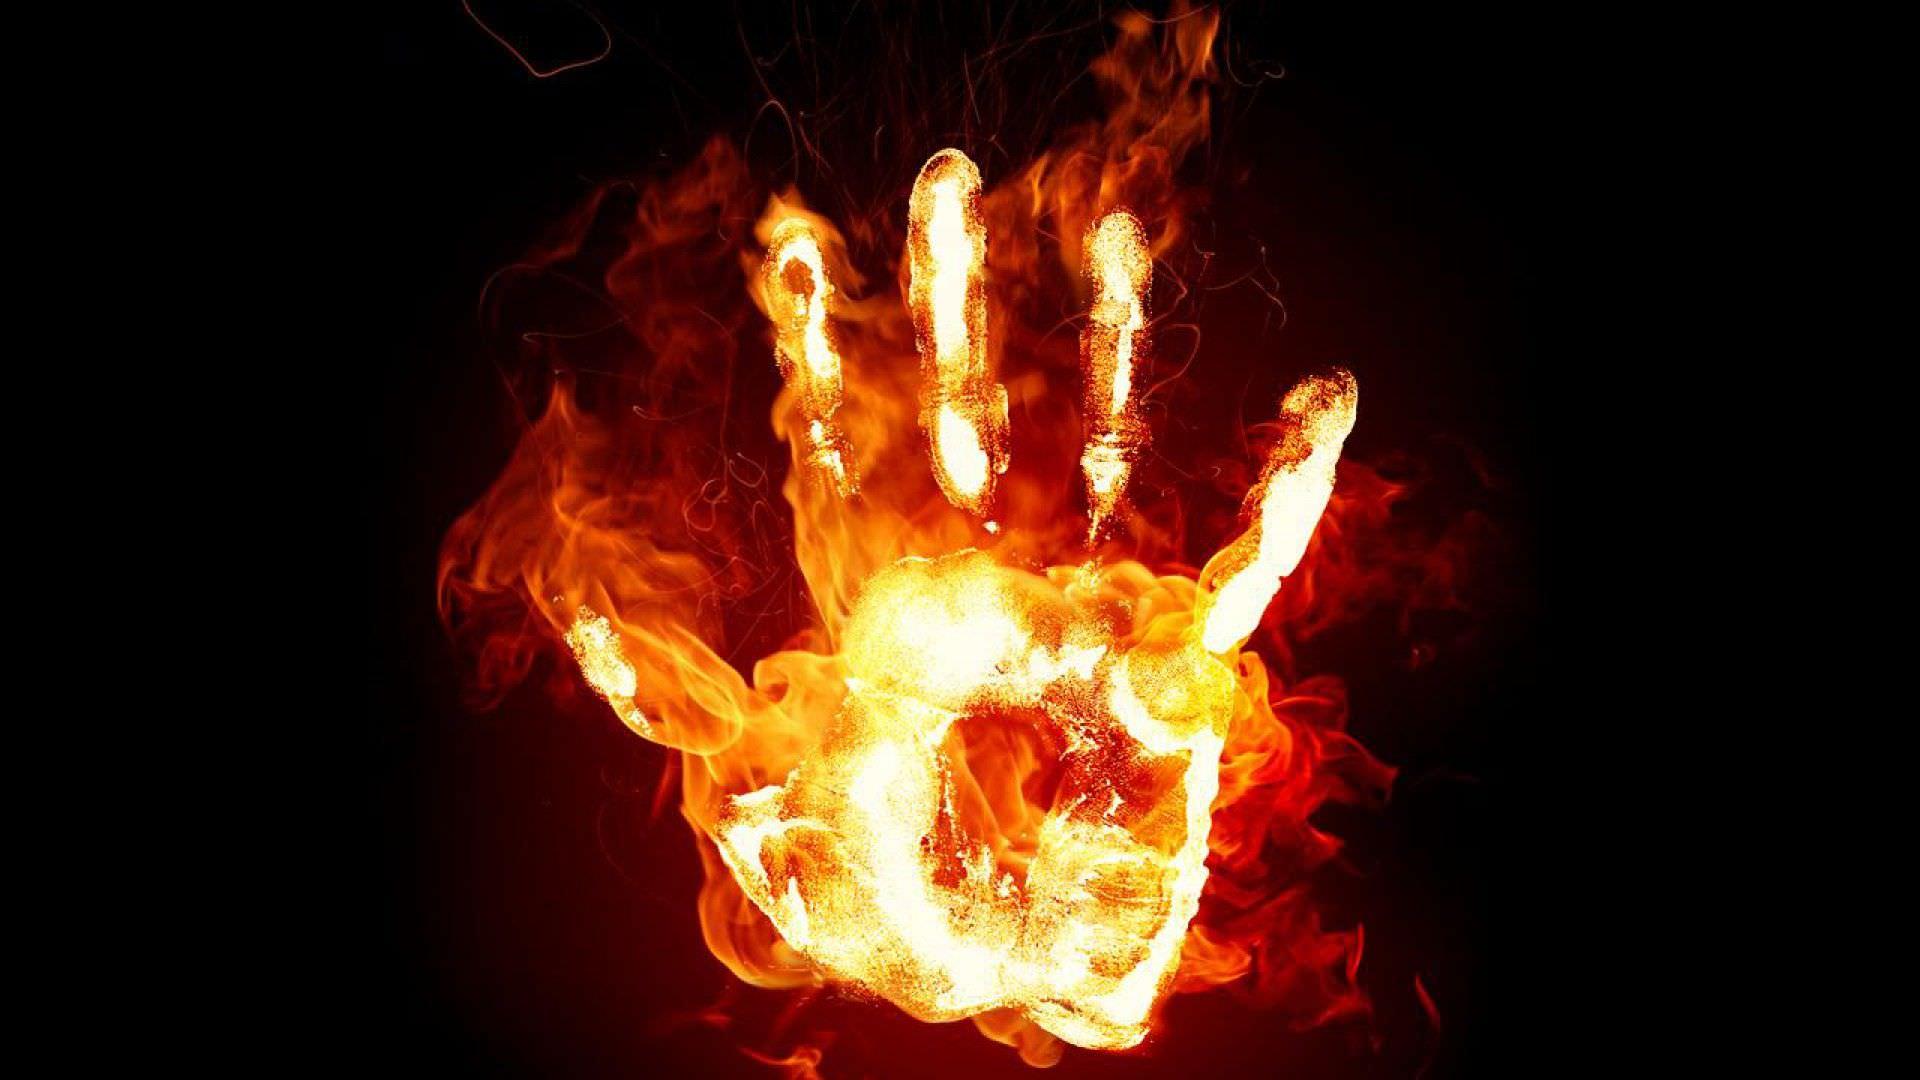 Hand-on-Fire-Wallpaper-For-Free.jpg